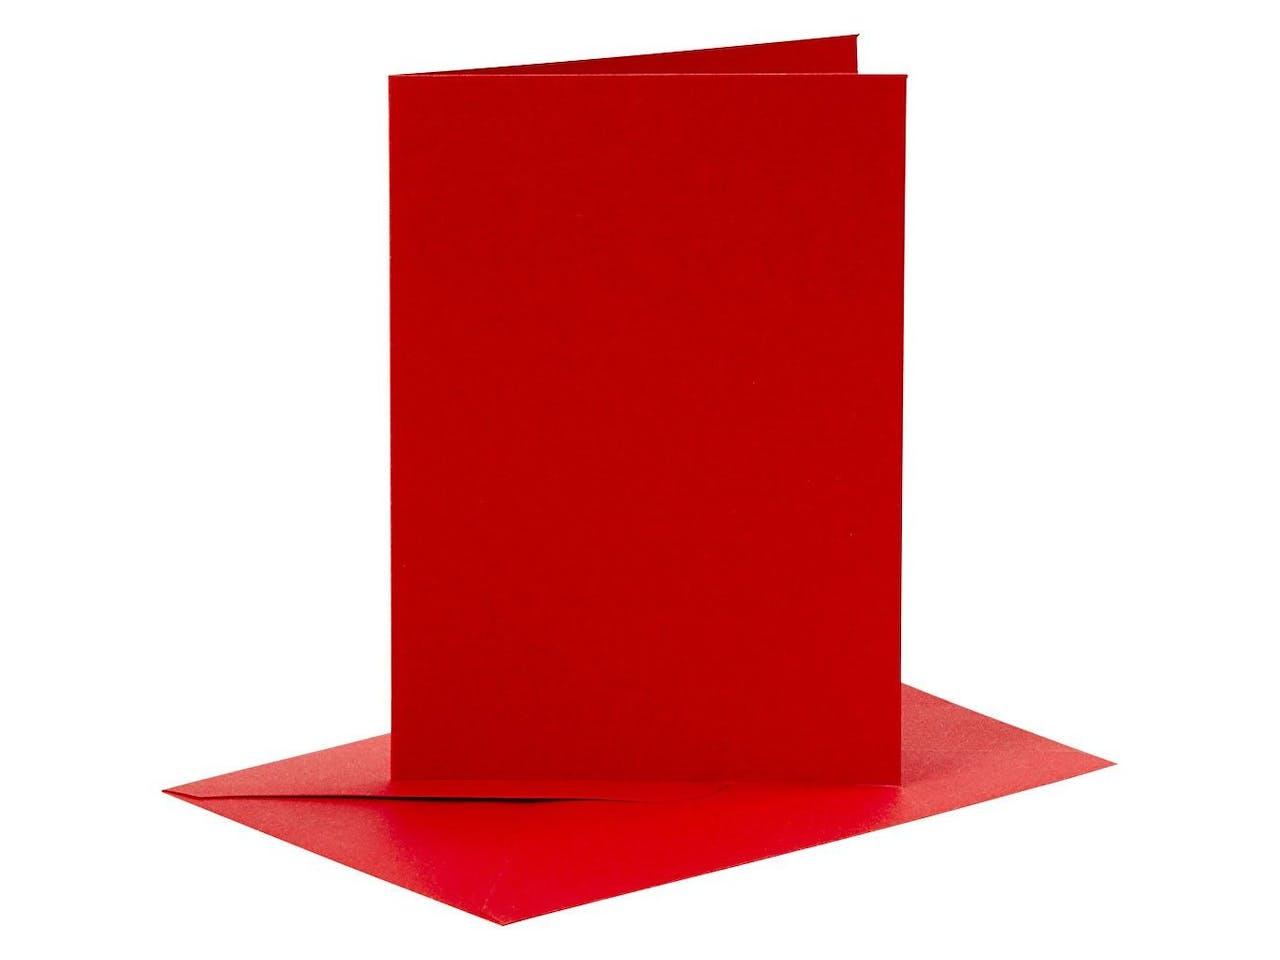 Blankokarten-Set, je 6 Klappkarten A6 & Kuverts C6, rot